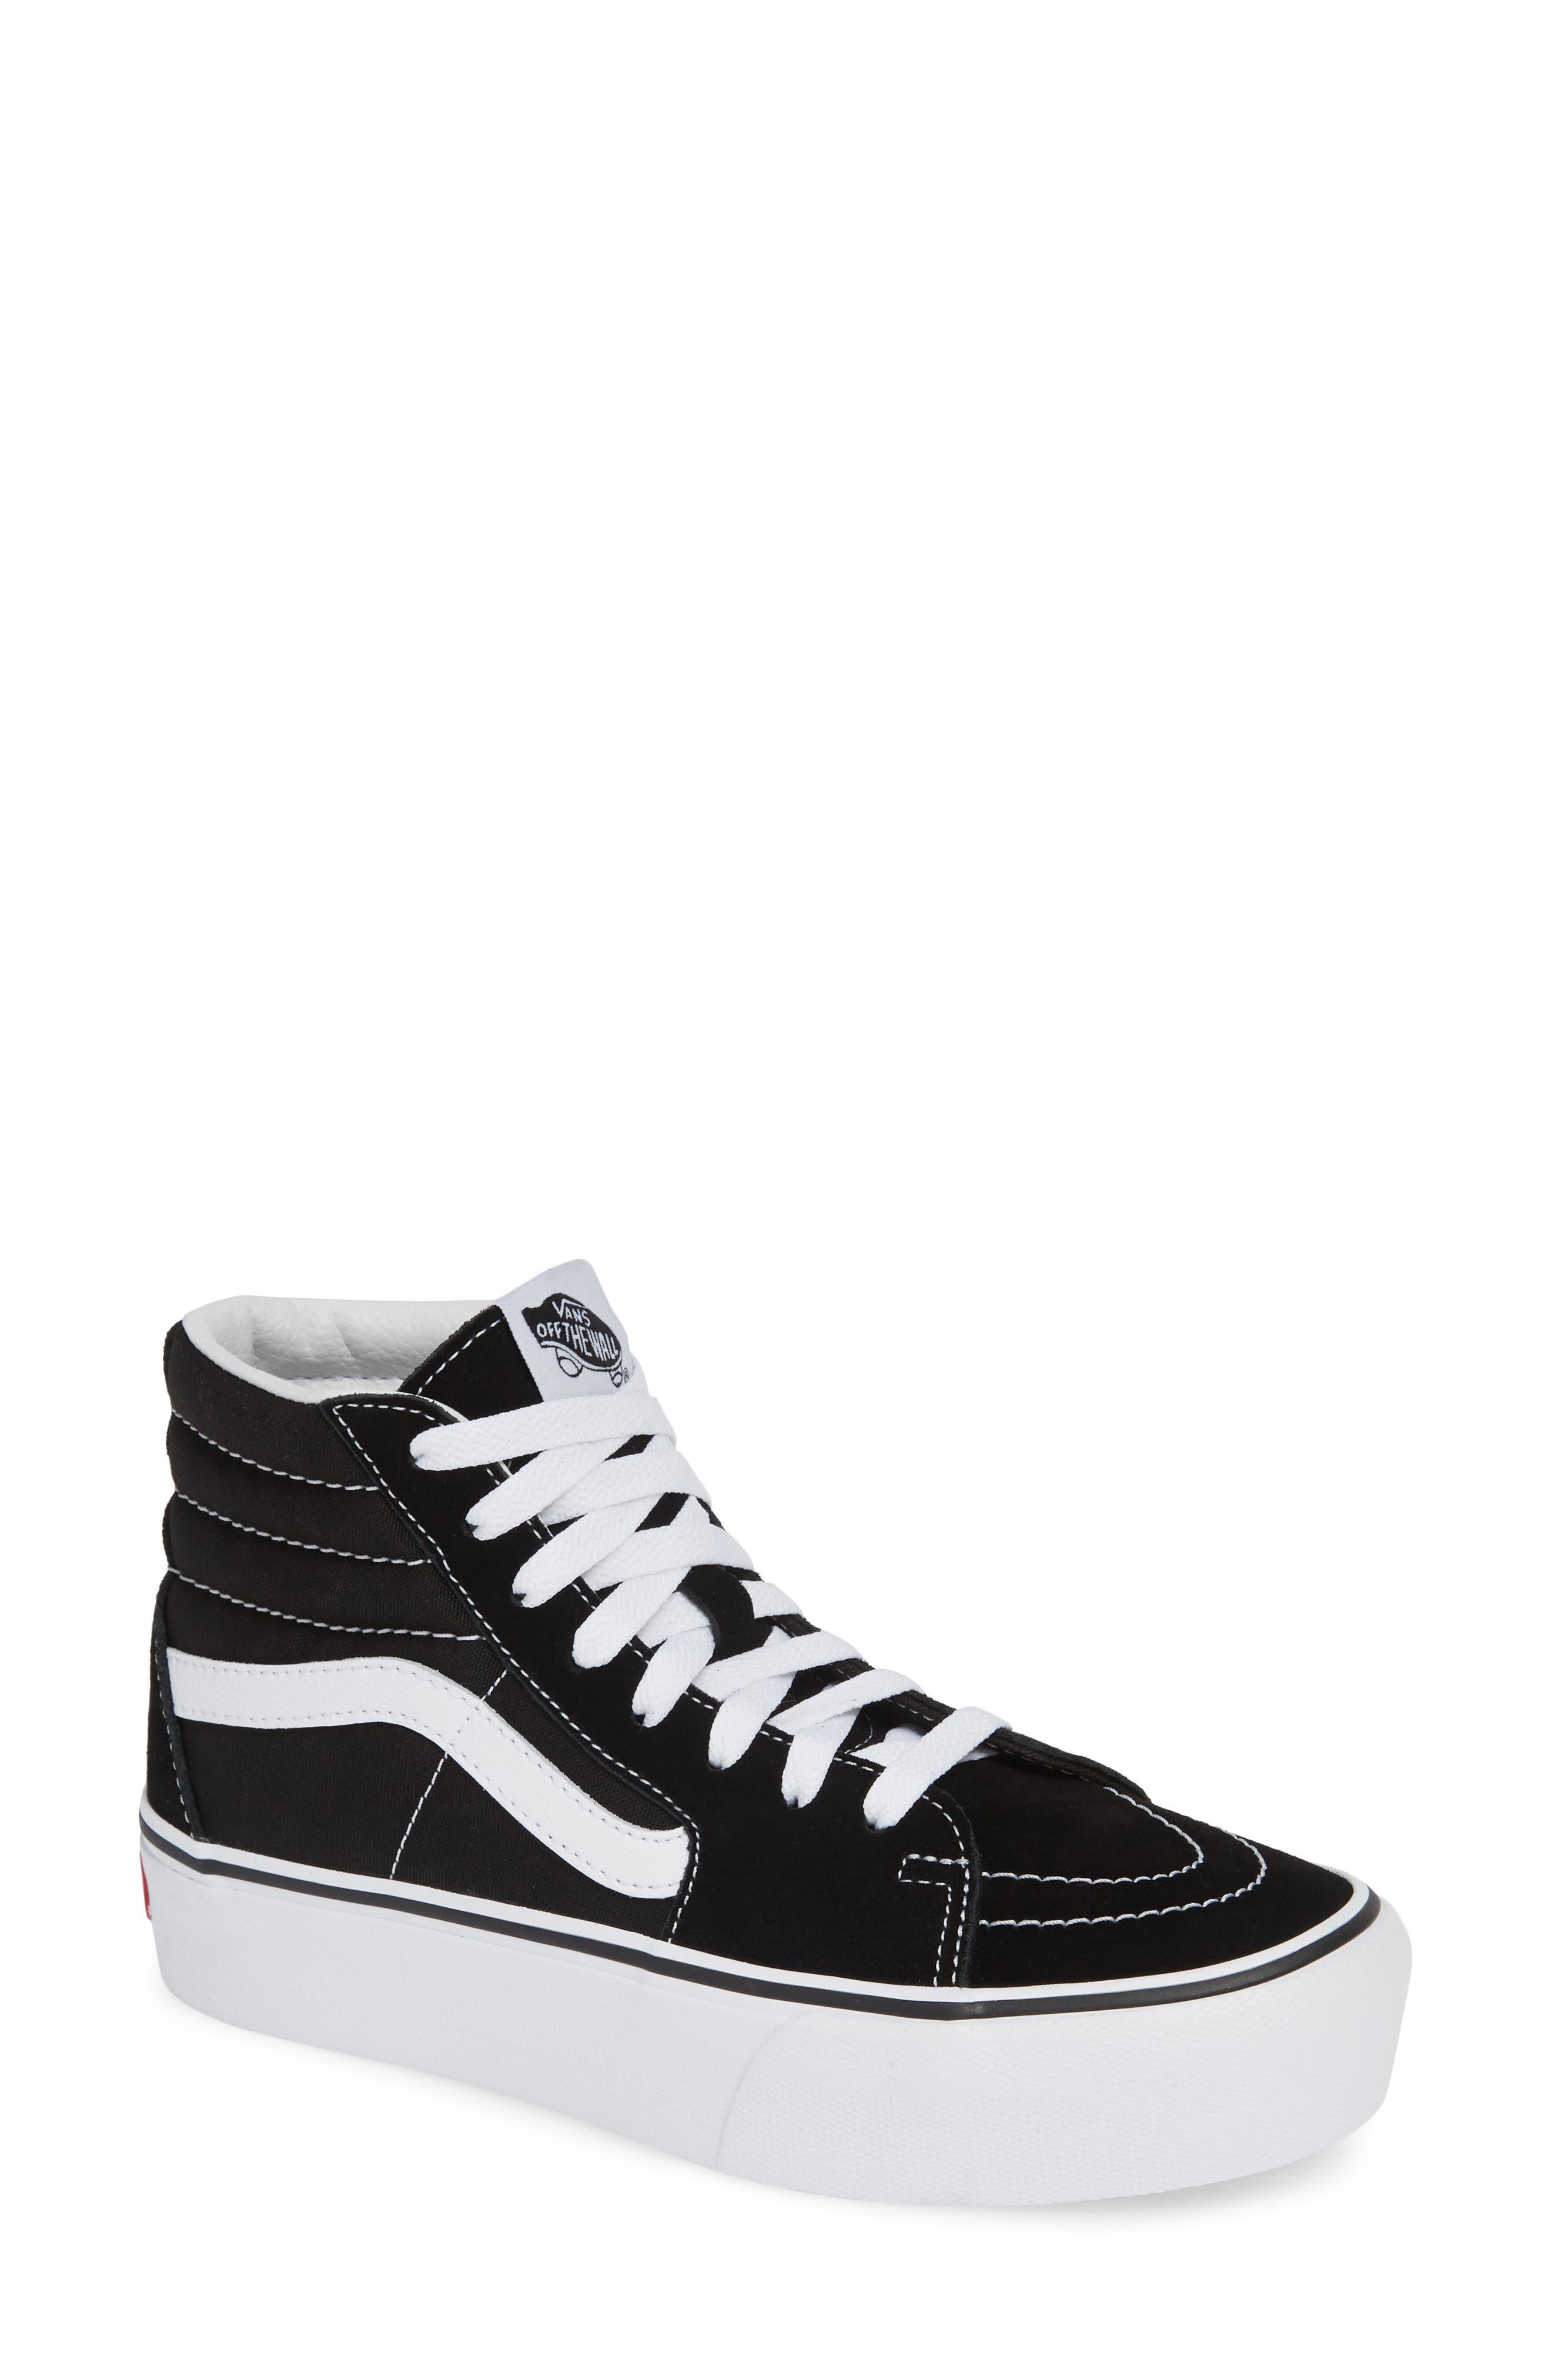 Sk8-Hi Platform Sneaker,                             Main thumbnail 1, color,                             BLACK/ TRUE WHITE